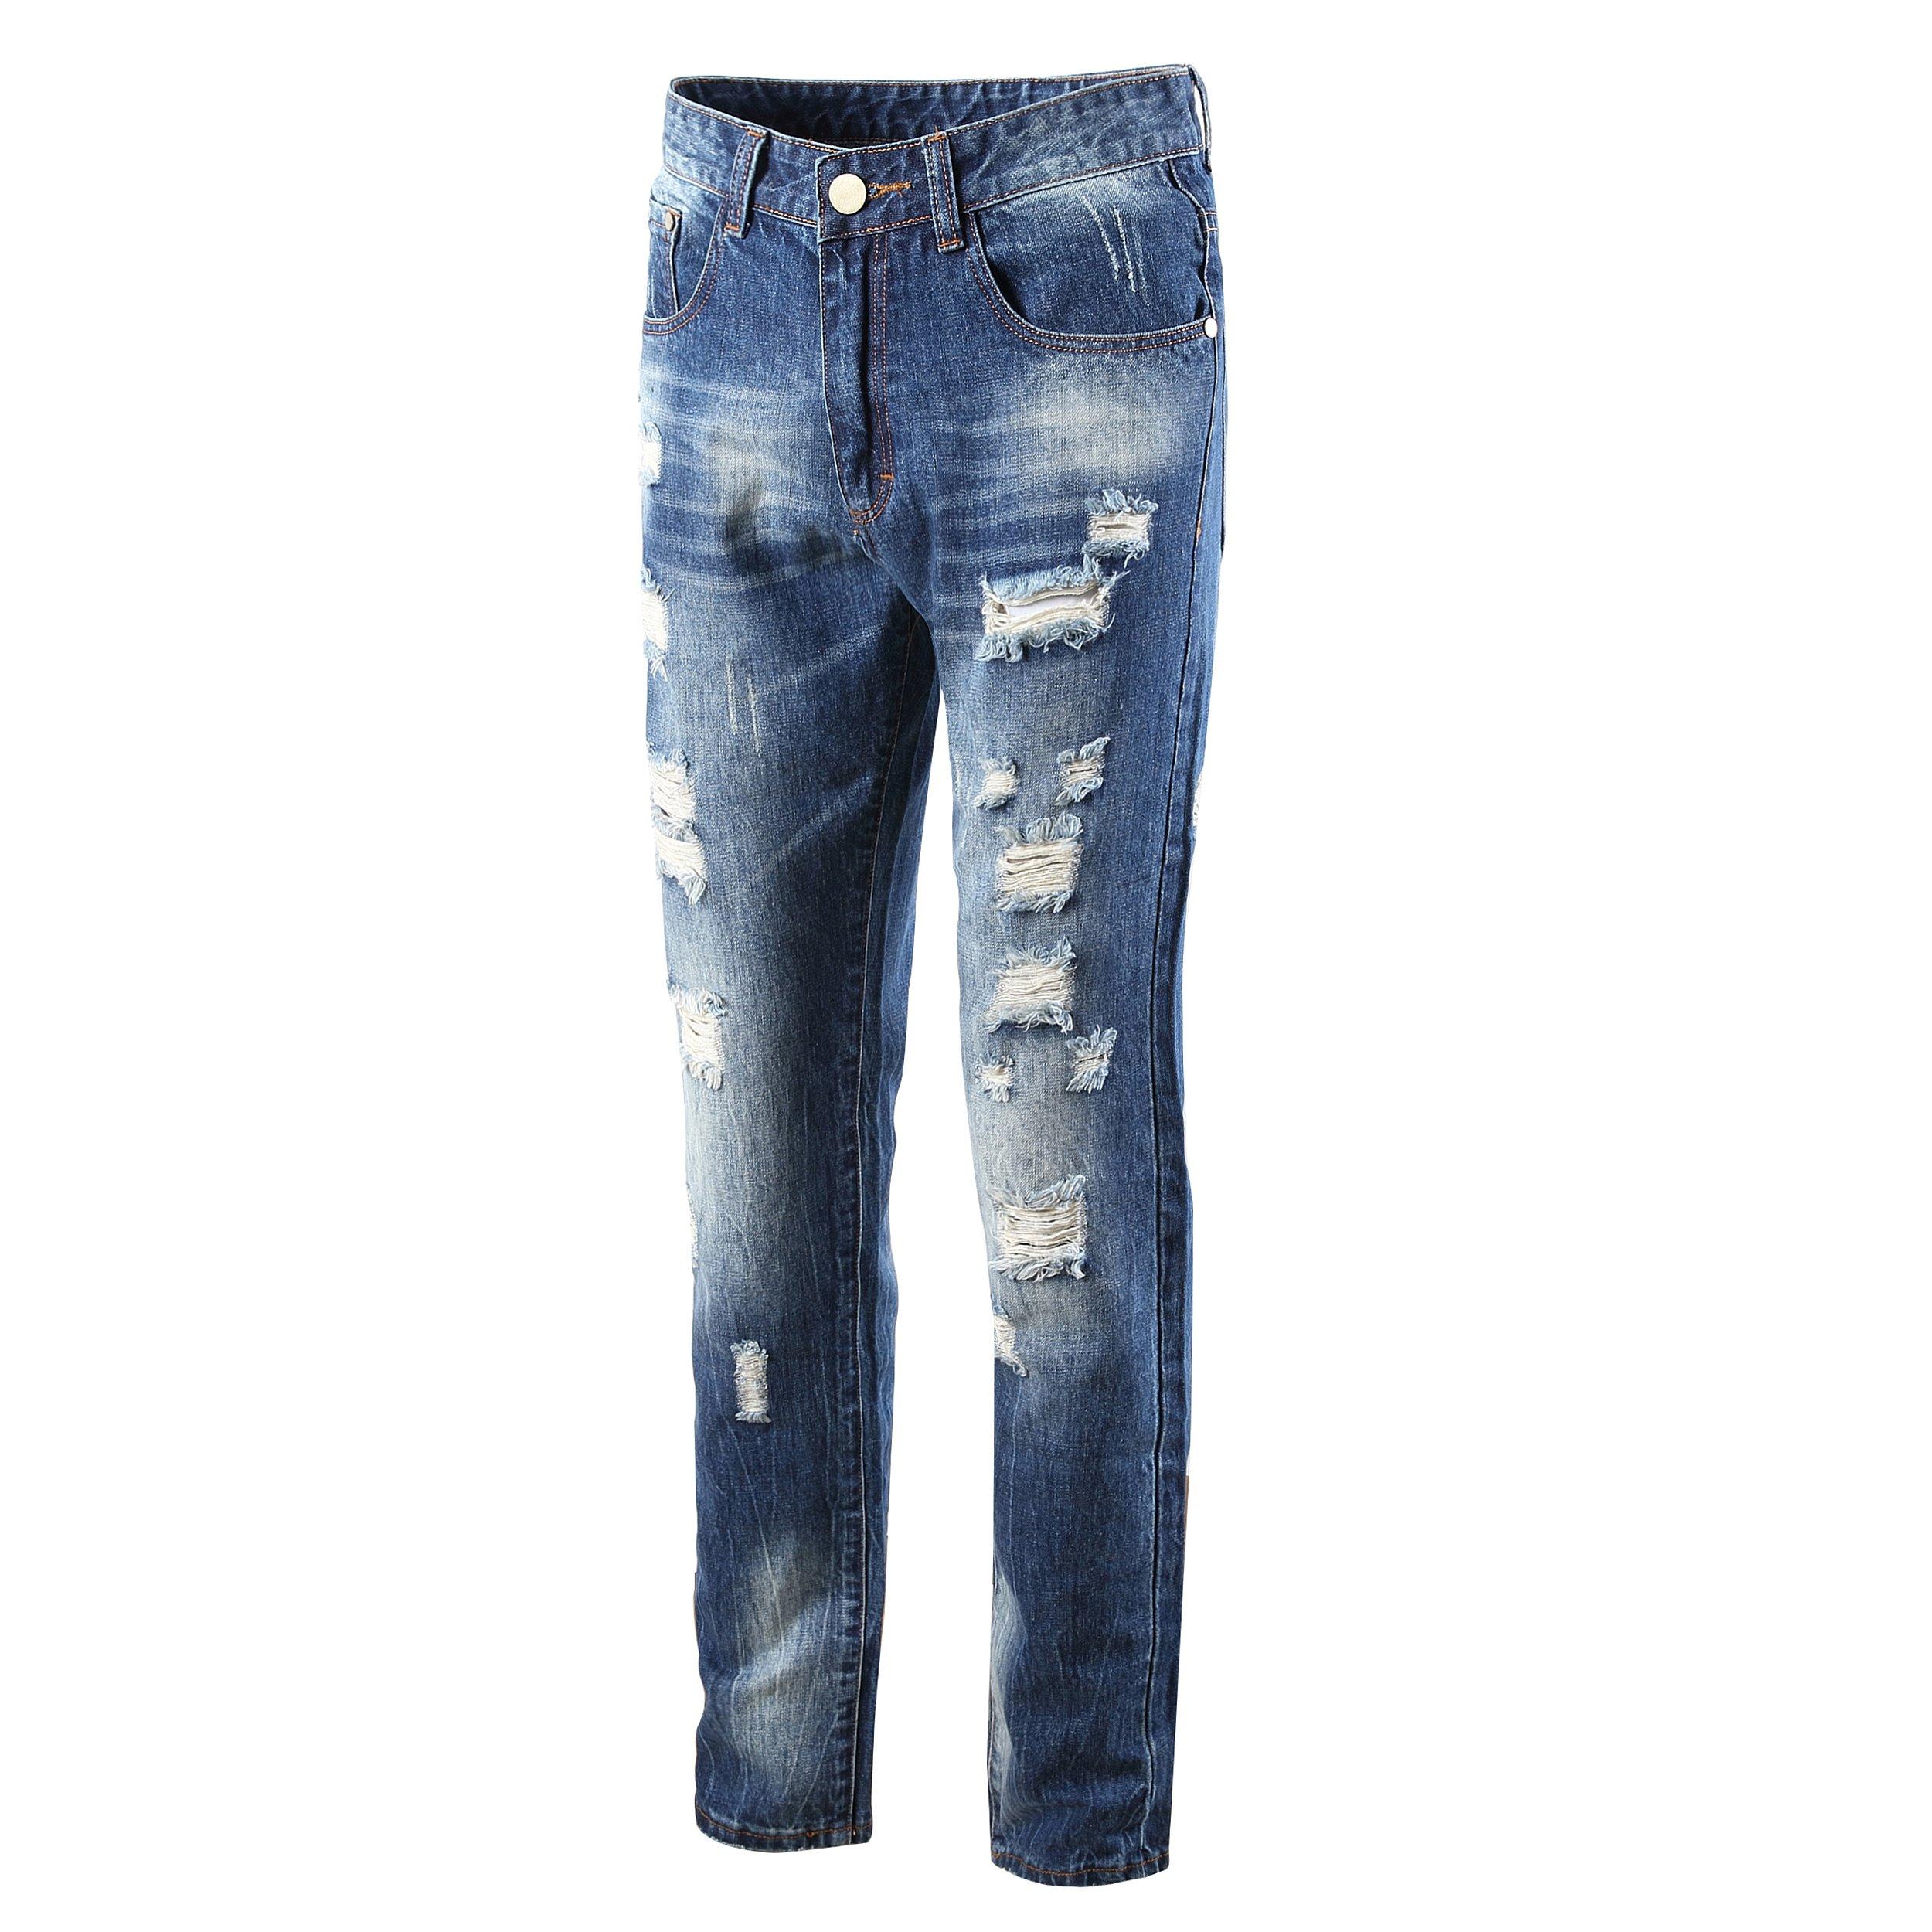 DAVID.ANN Men's Straight Fit Distressed Ripped Denim Jeans,Blue,32 by DAVID.ANN (Image #3)